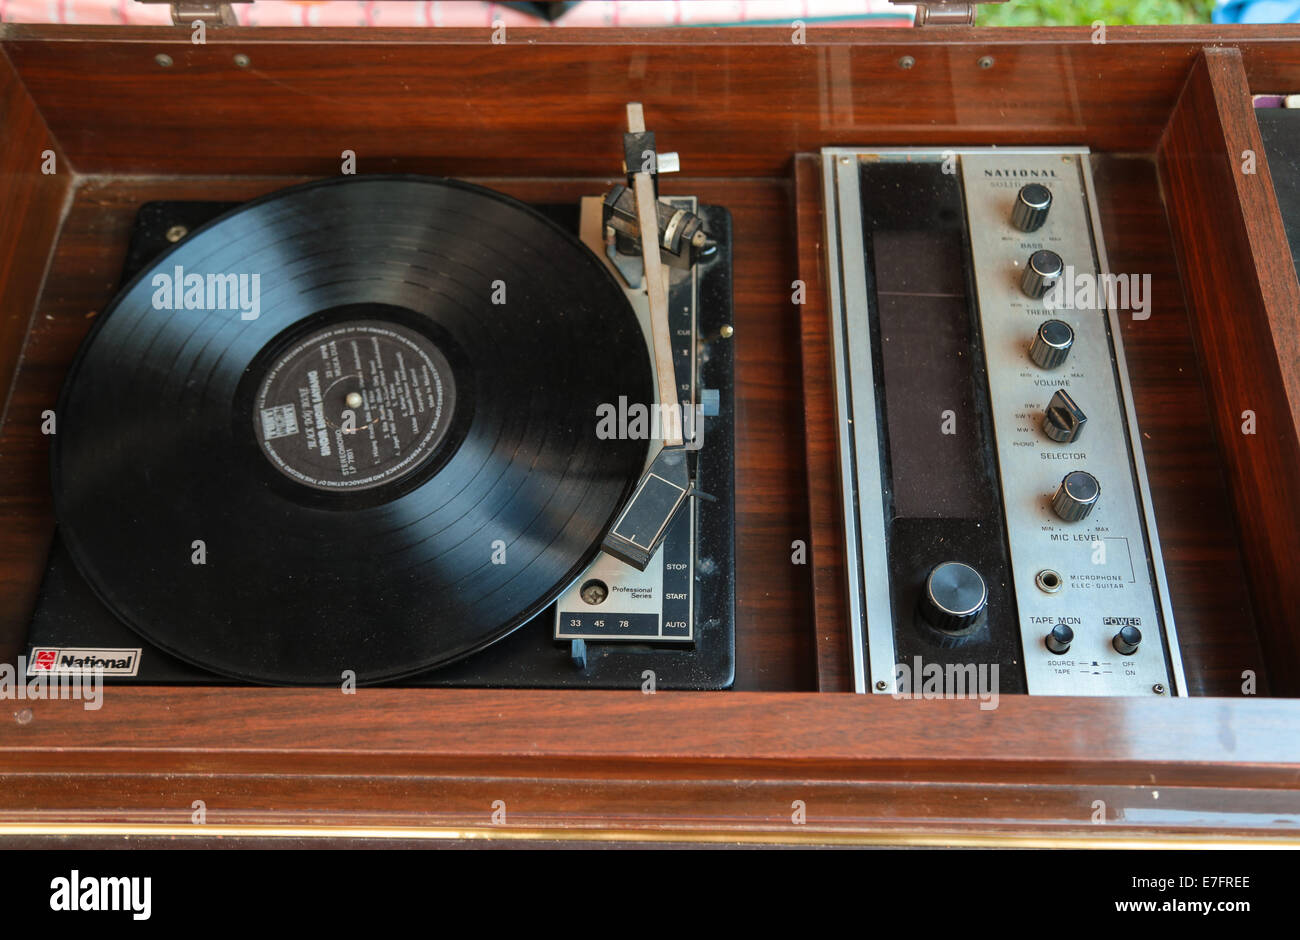 vinyl for sale old music stock photos vinyl for sale old music stock images alamy. Black Bedroom Furniture Sets. Home Design Ideas